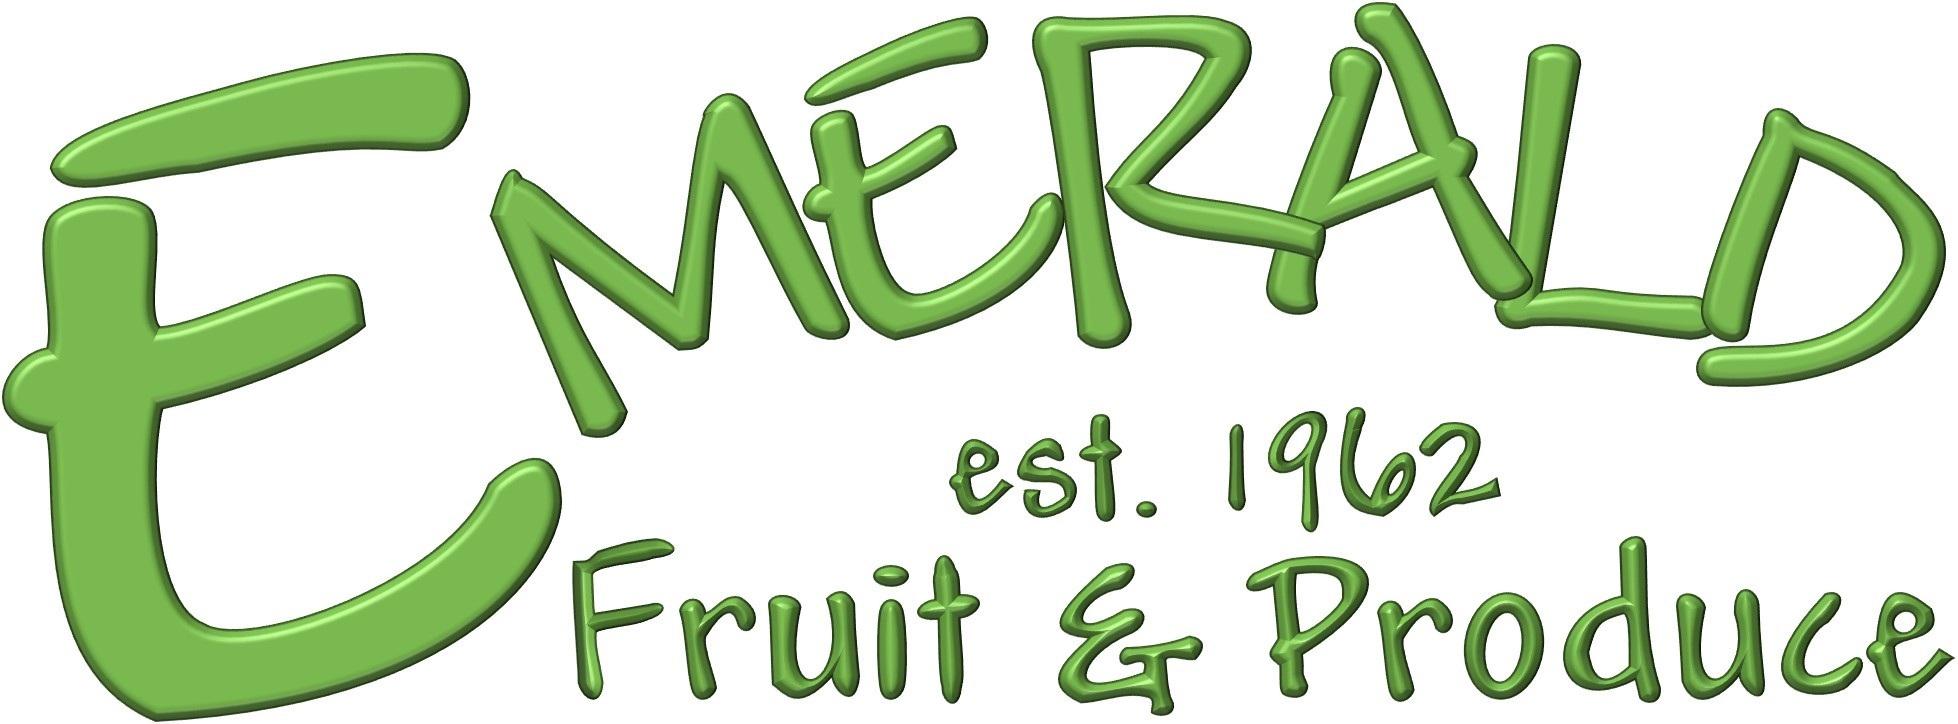 Emerald Fruit logo.jpg